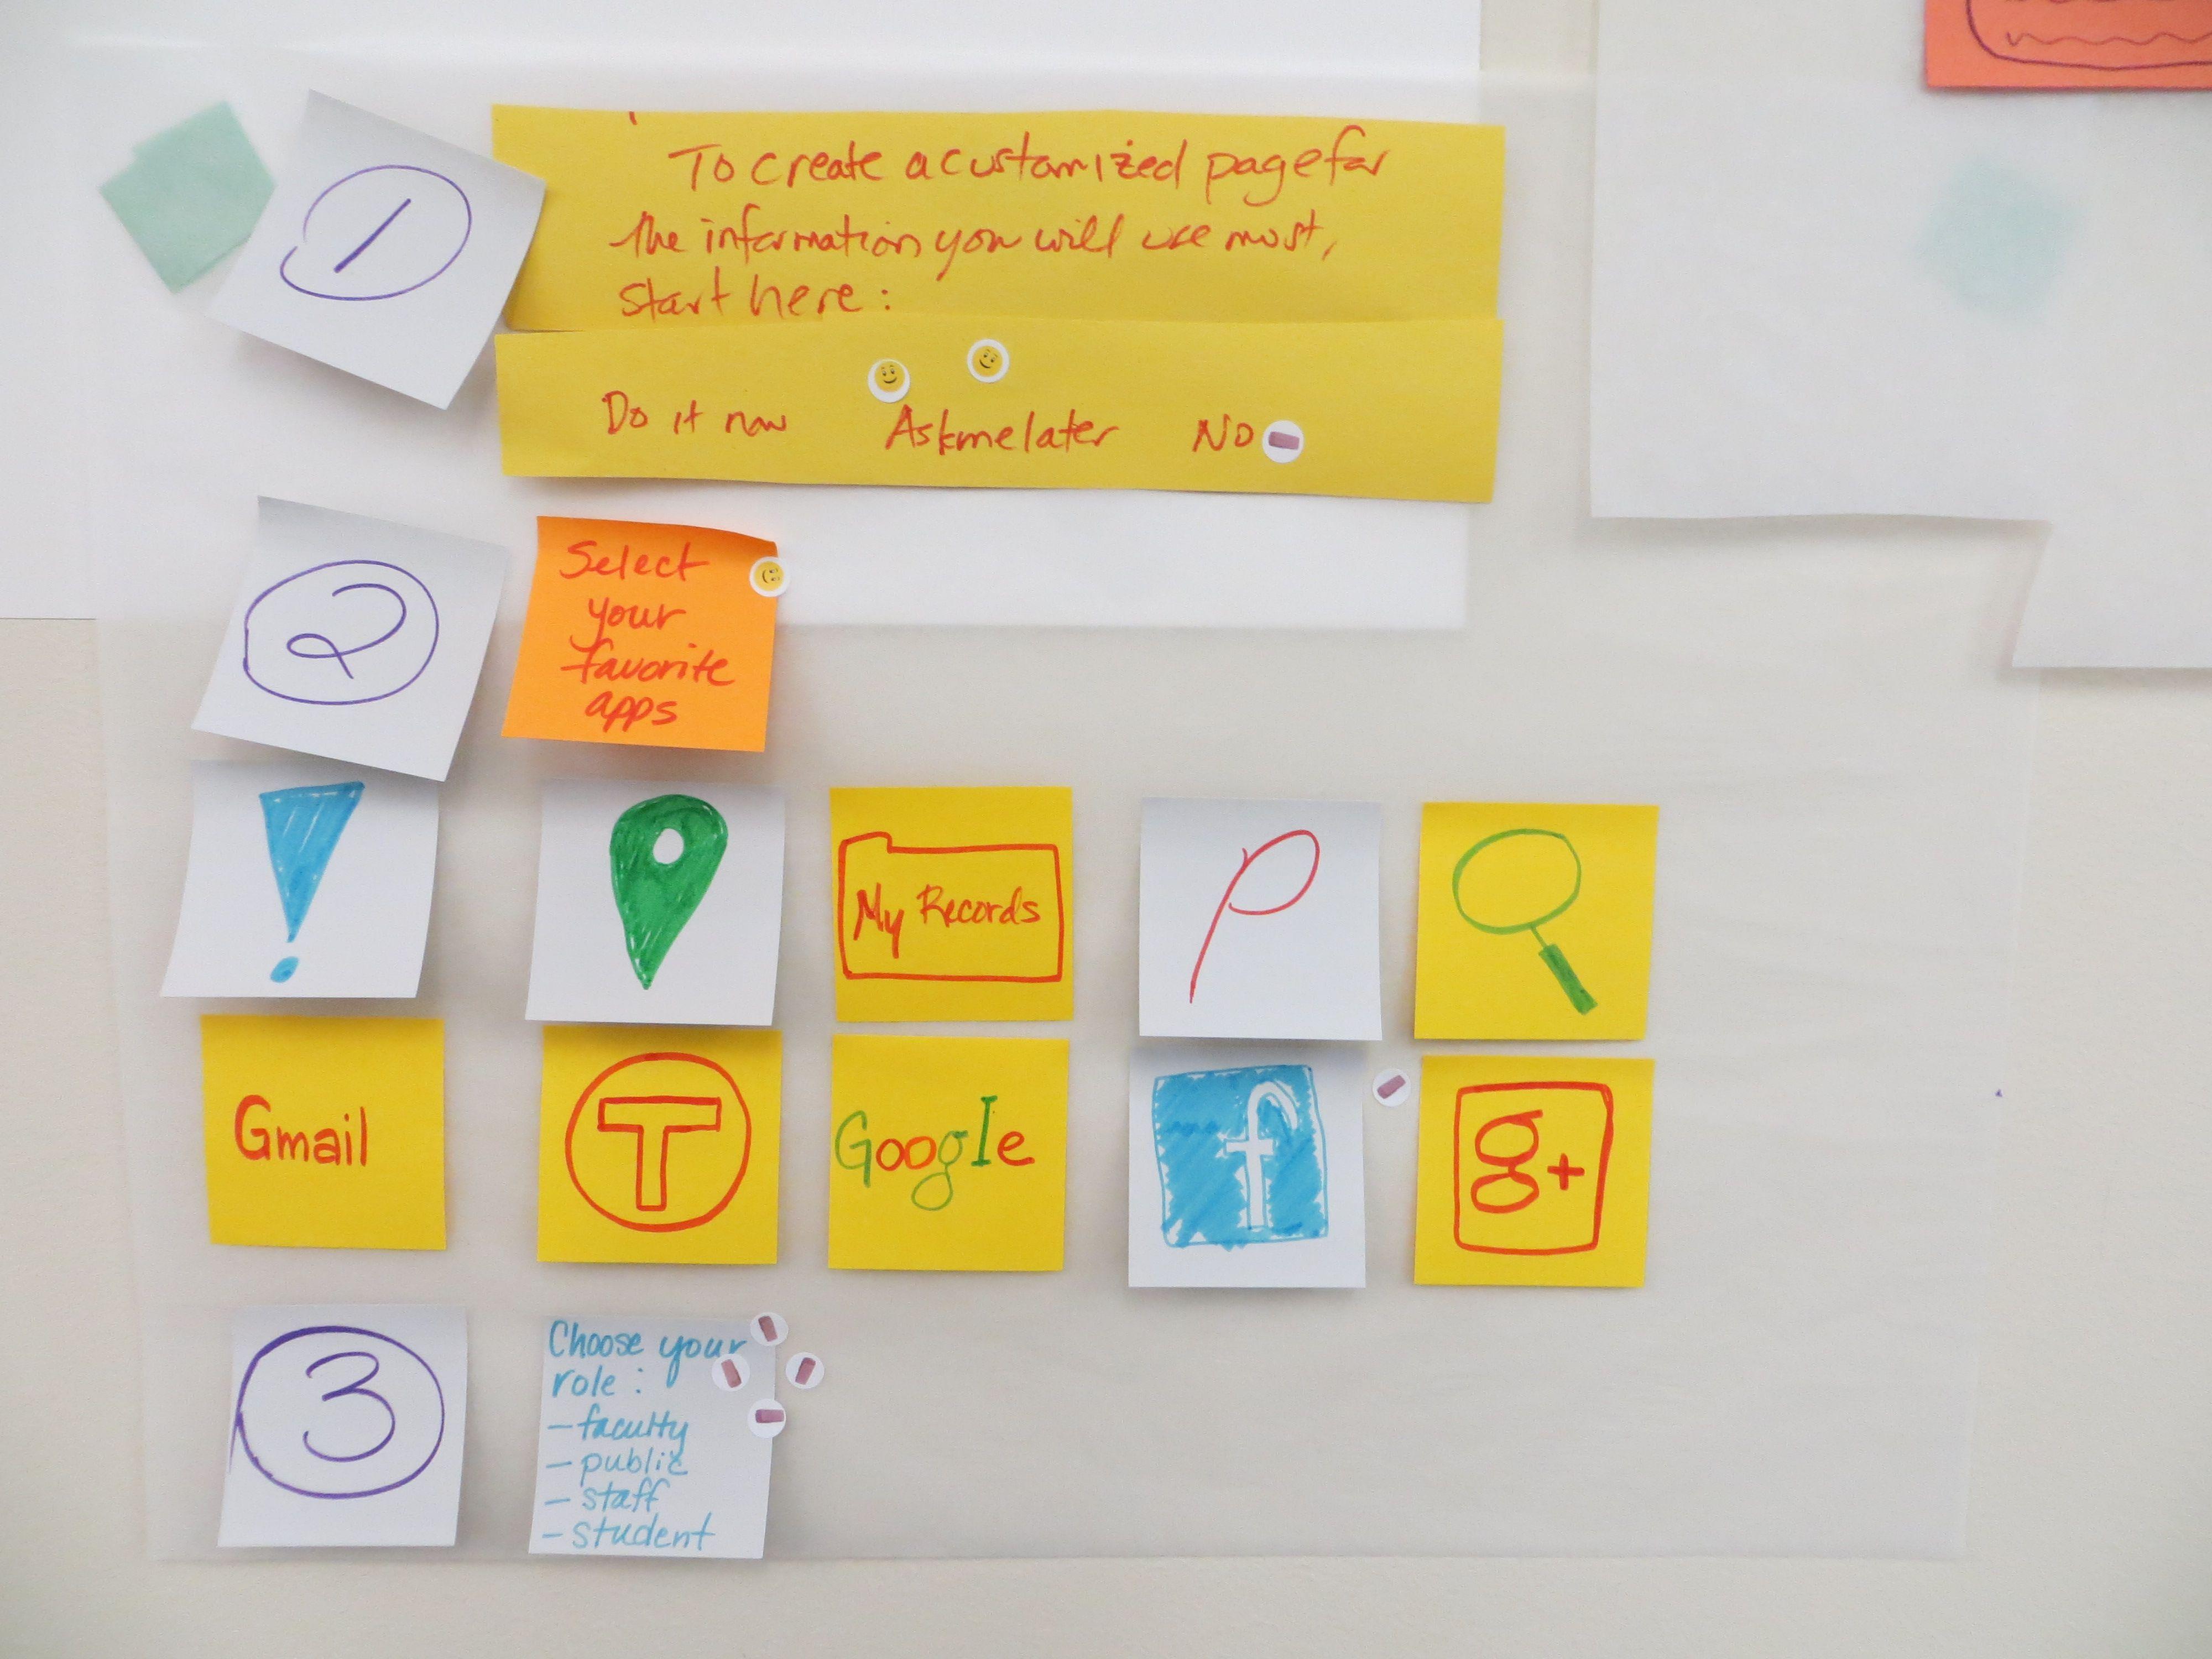 U Of M Portal April 10 2013 Team 1 Https Docs Google Com A Umn Edu File D 0b1wospkebxvkumw2mhg2yujryu With Images Design Thinking Workshop Design Thinking 10 Things